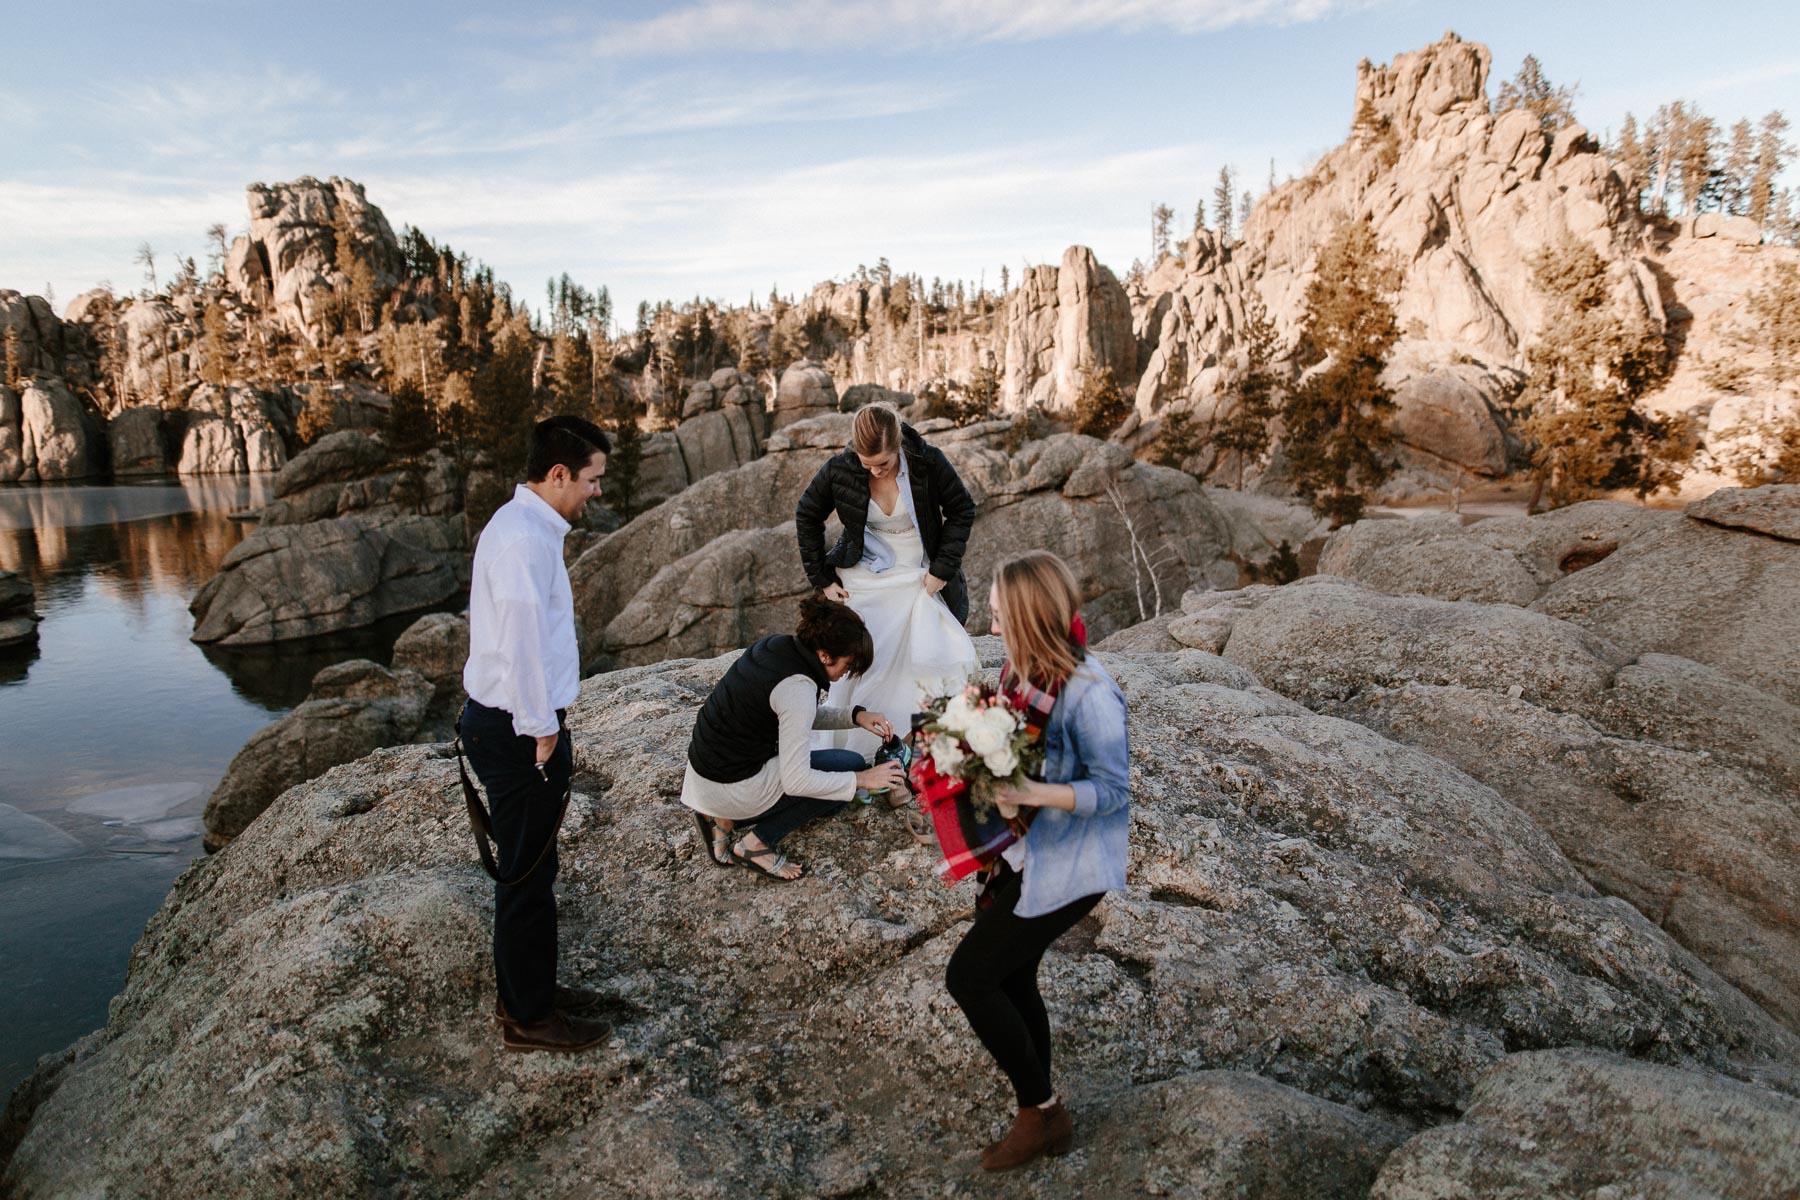 sioux-falls-black-hills-rapid-city-elopement-wedding-adventure-photographer-custer-sylvan-lake-35.jpg